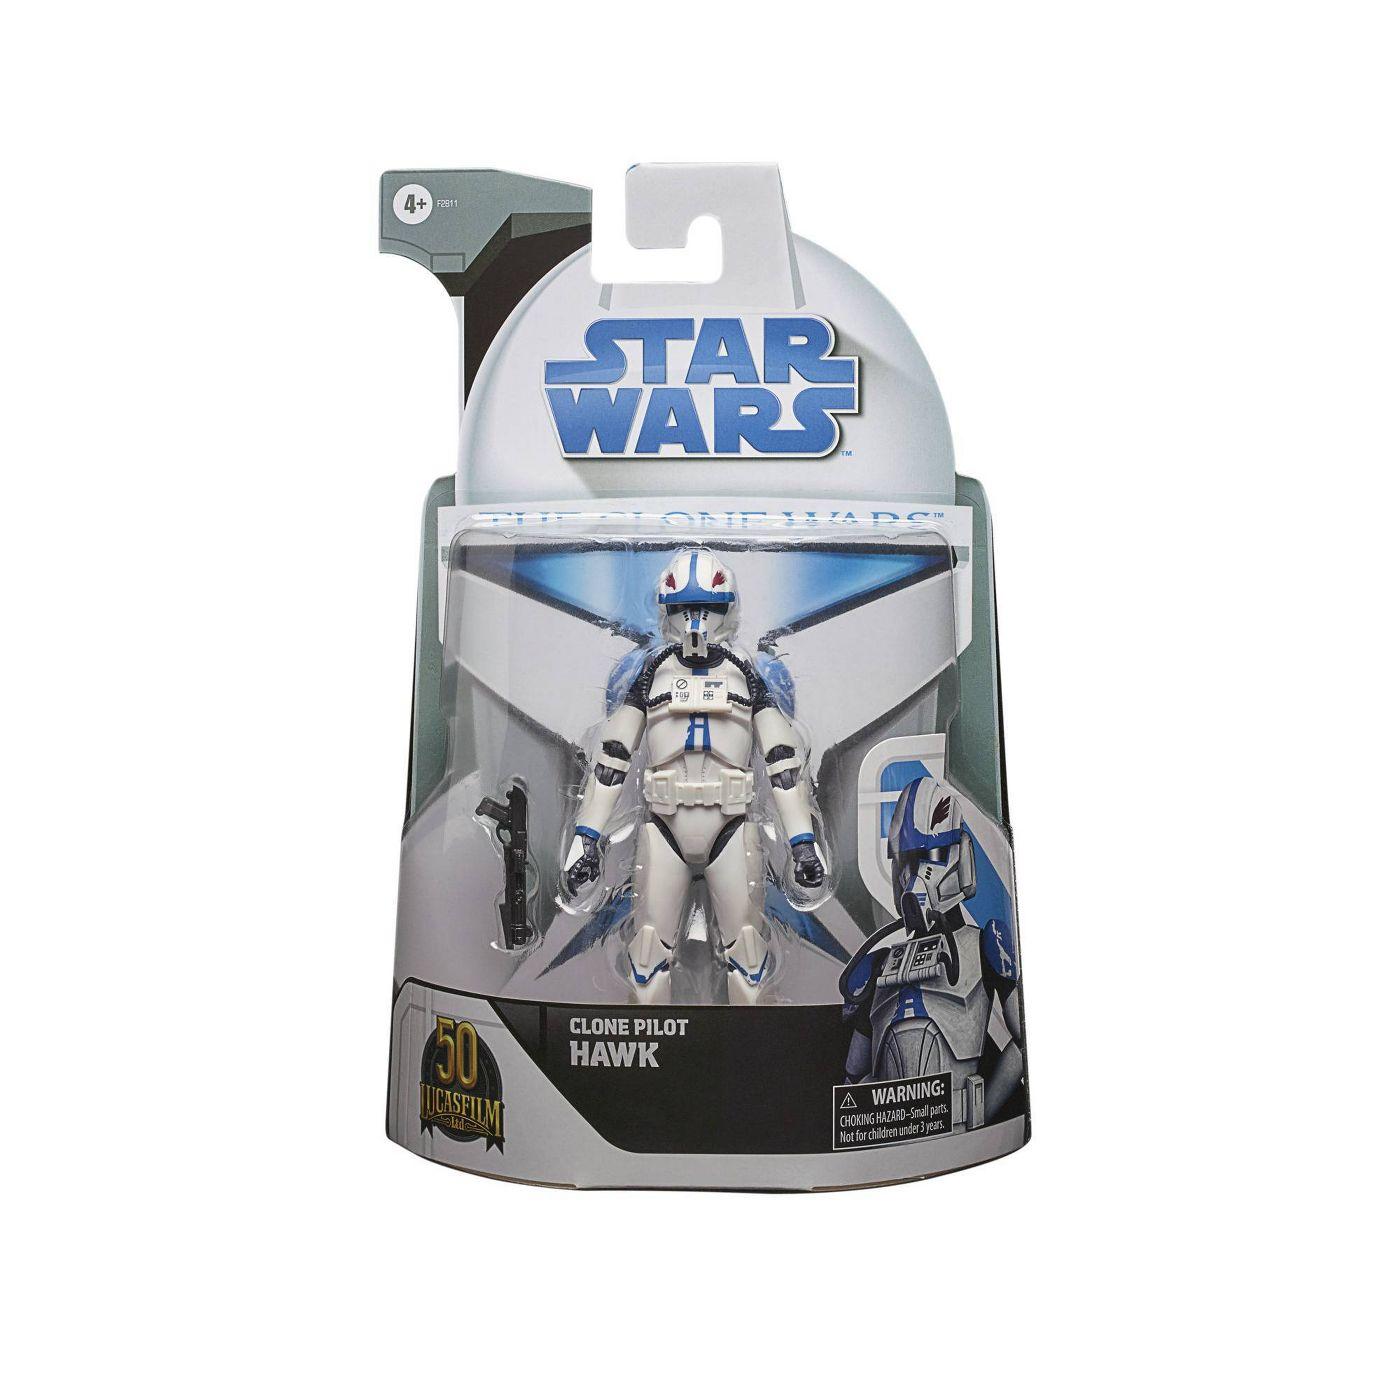 Star Wars TBS The Clone Wars Lucasfilm 50th Anniv Clone Pilot Hawk 6-Inch Action Figure画像